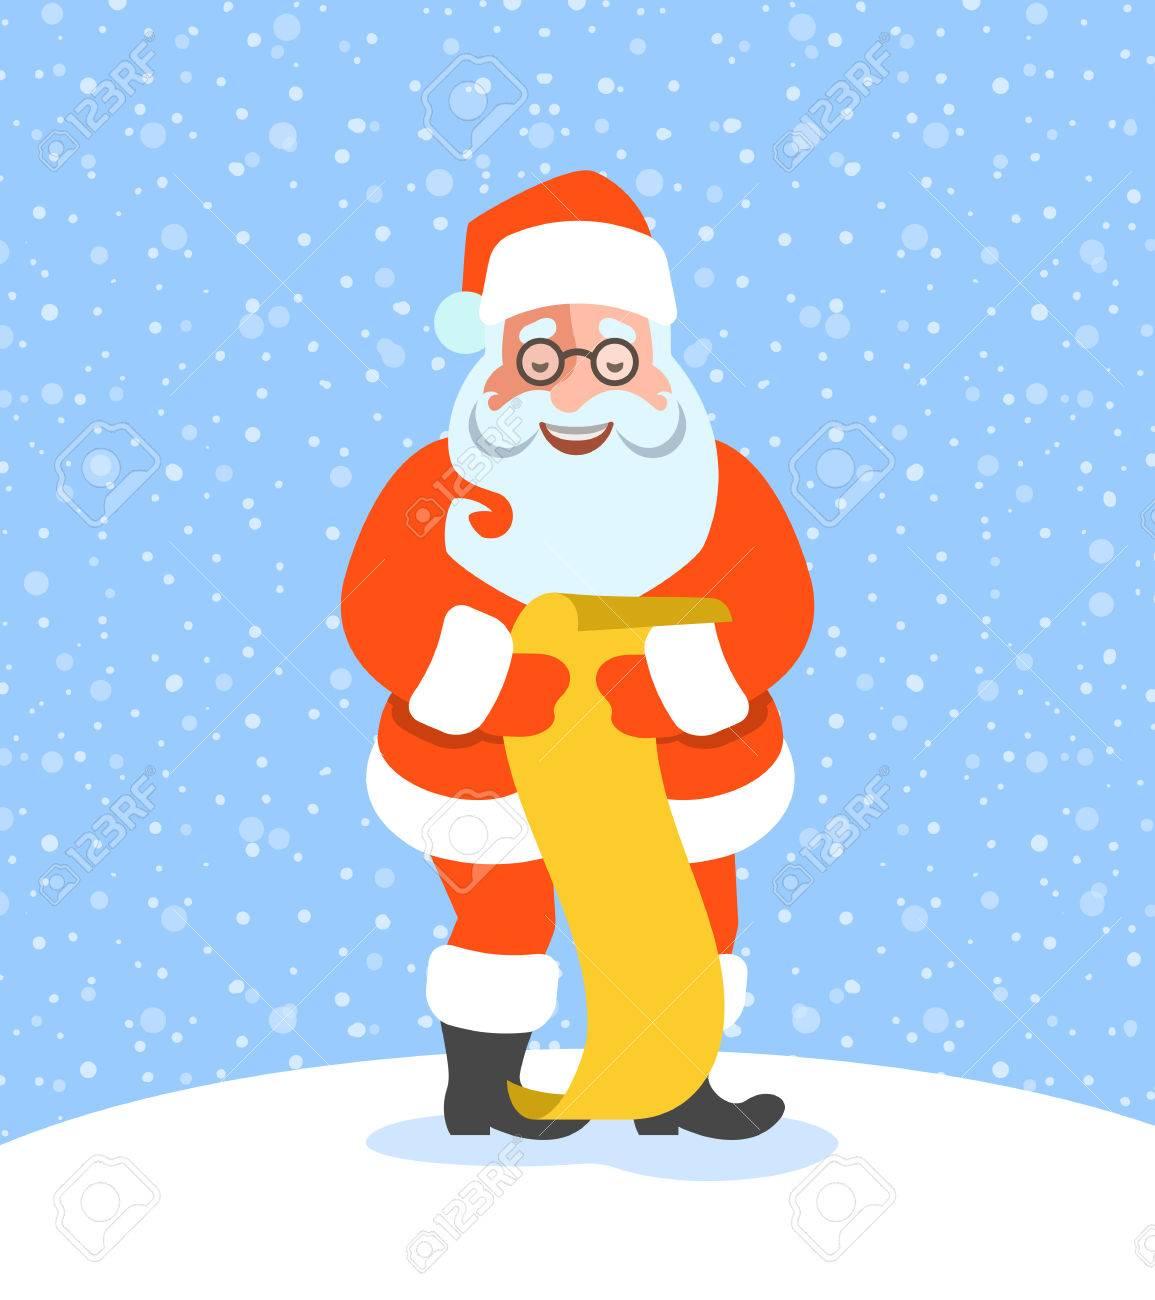 Santa Claus Reads Naughty Or Nice Kids List Cartoon Vector